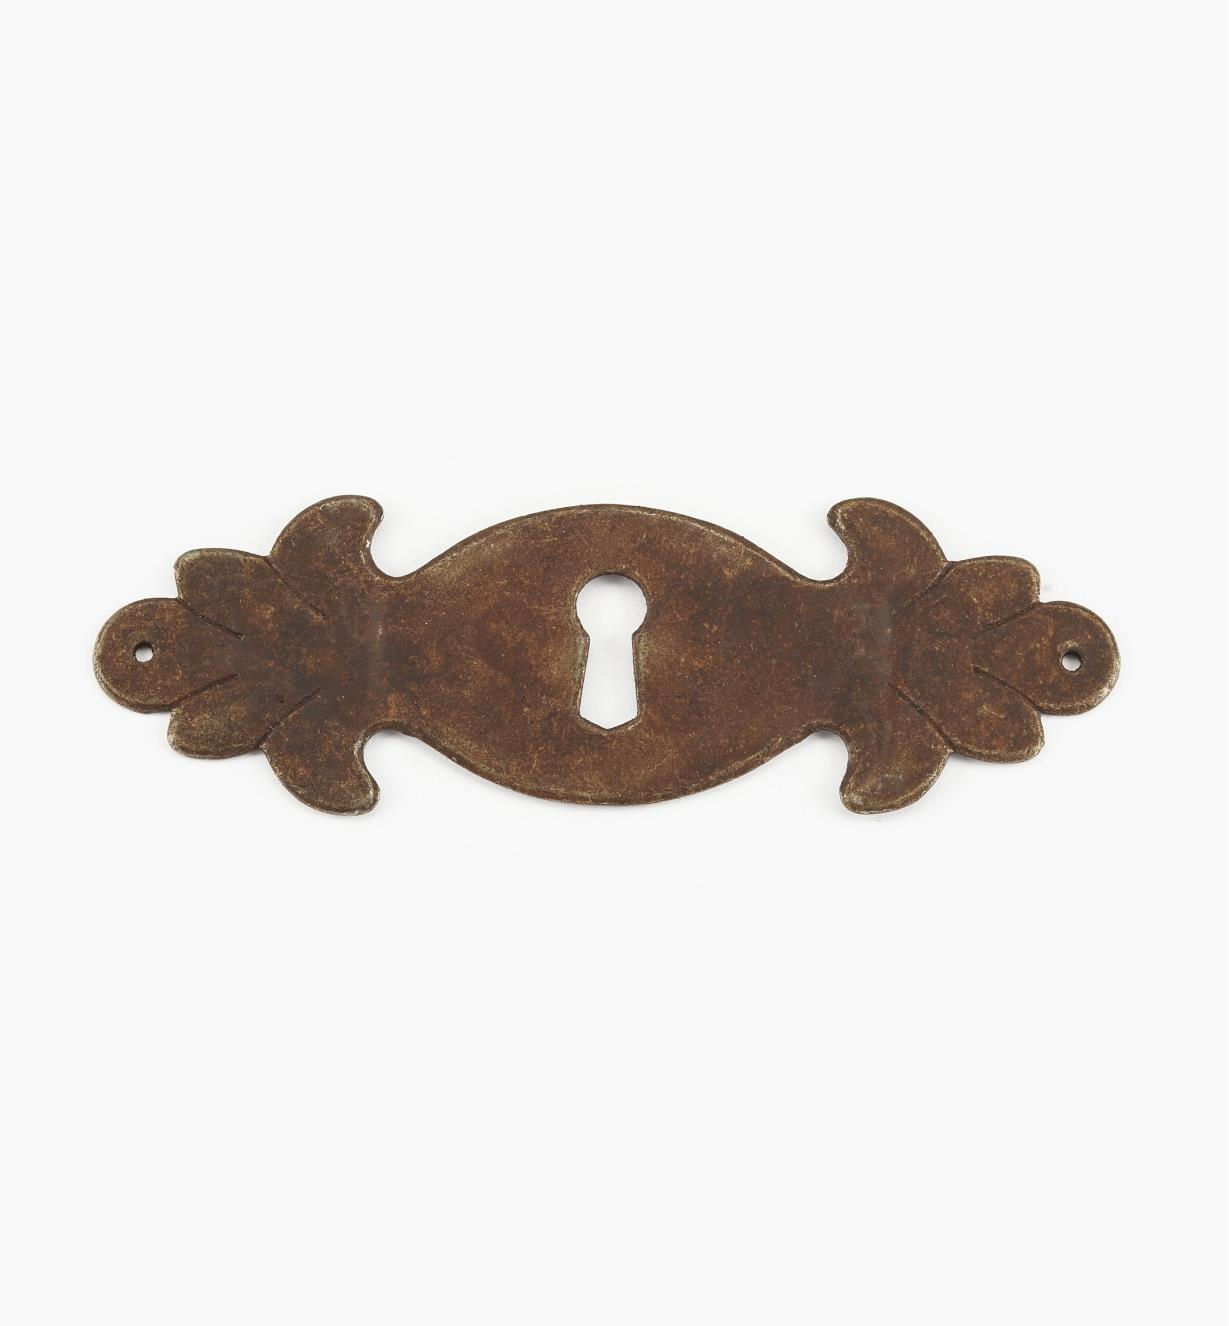 "01A2926 - 4 1/2"" Steel Plate Horizontal Keyhole Escutcheon"